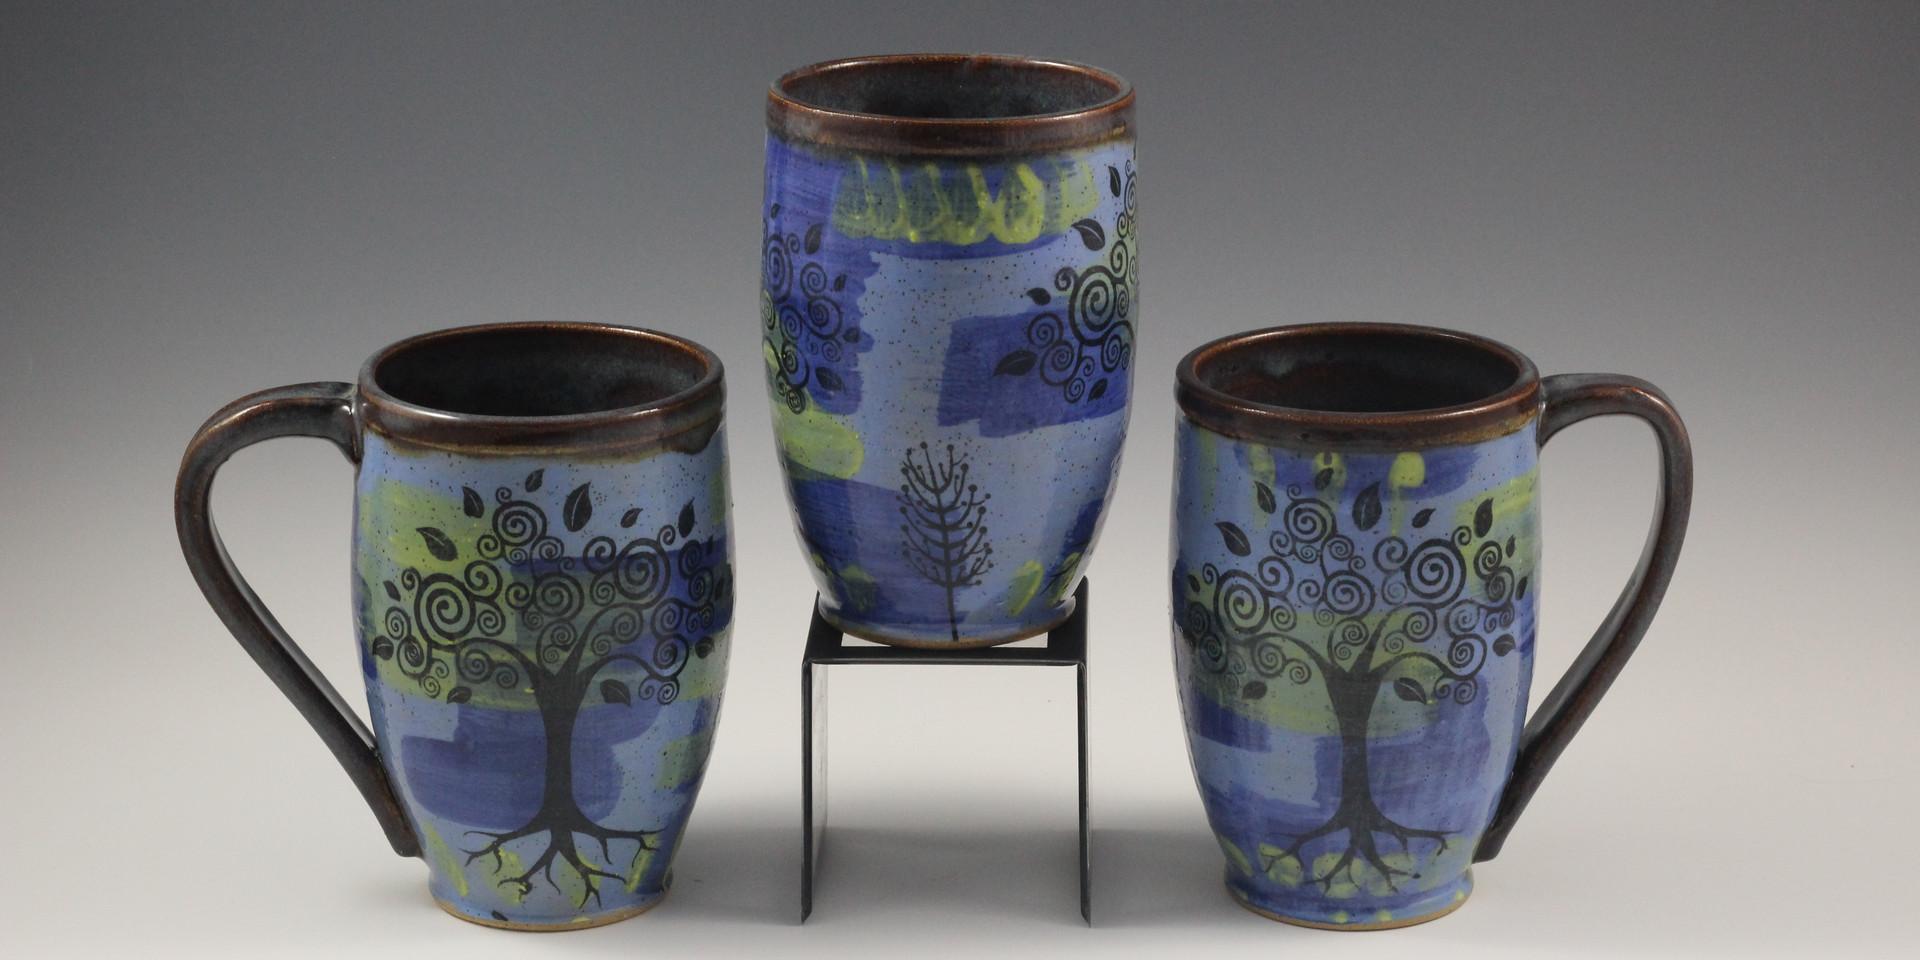 Whimsical Tree/Tree of Life Mugs